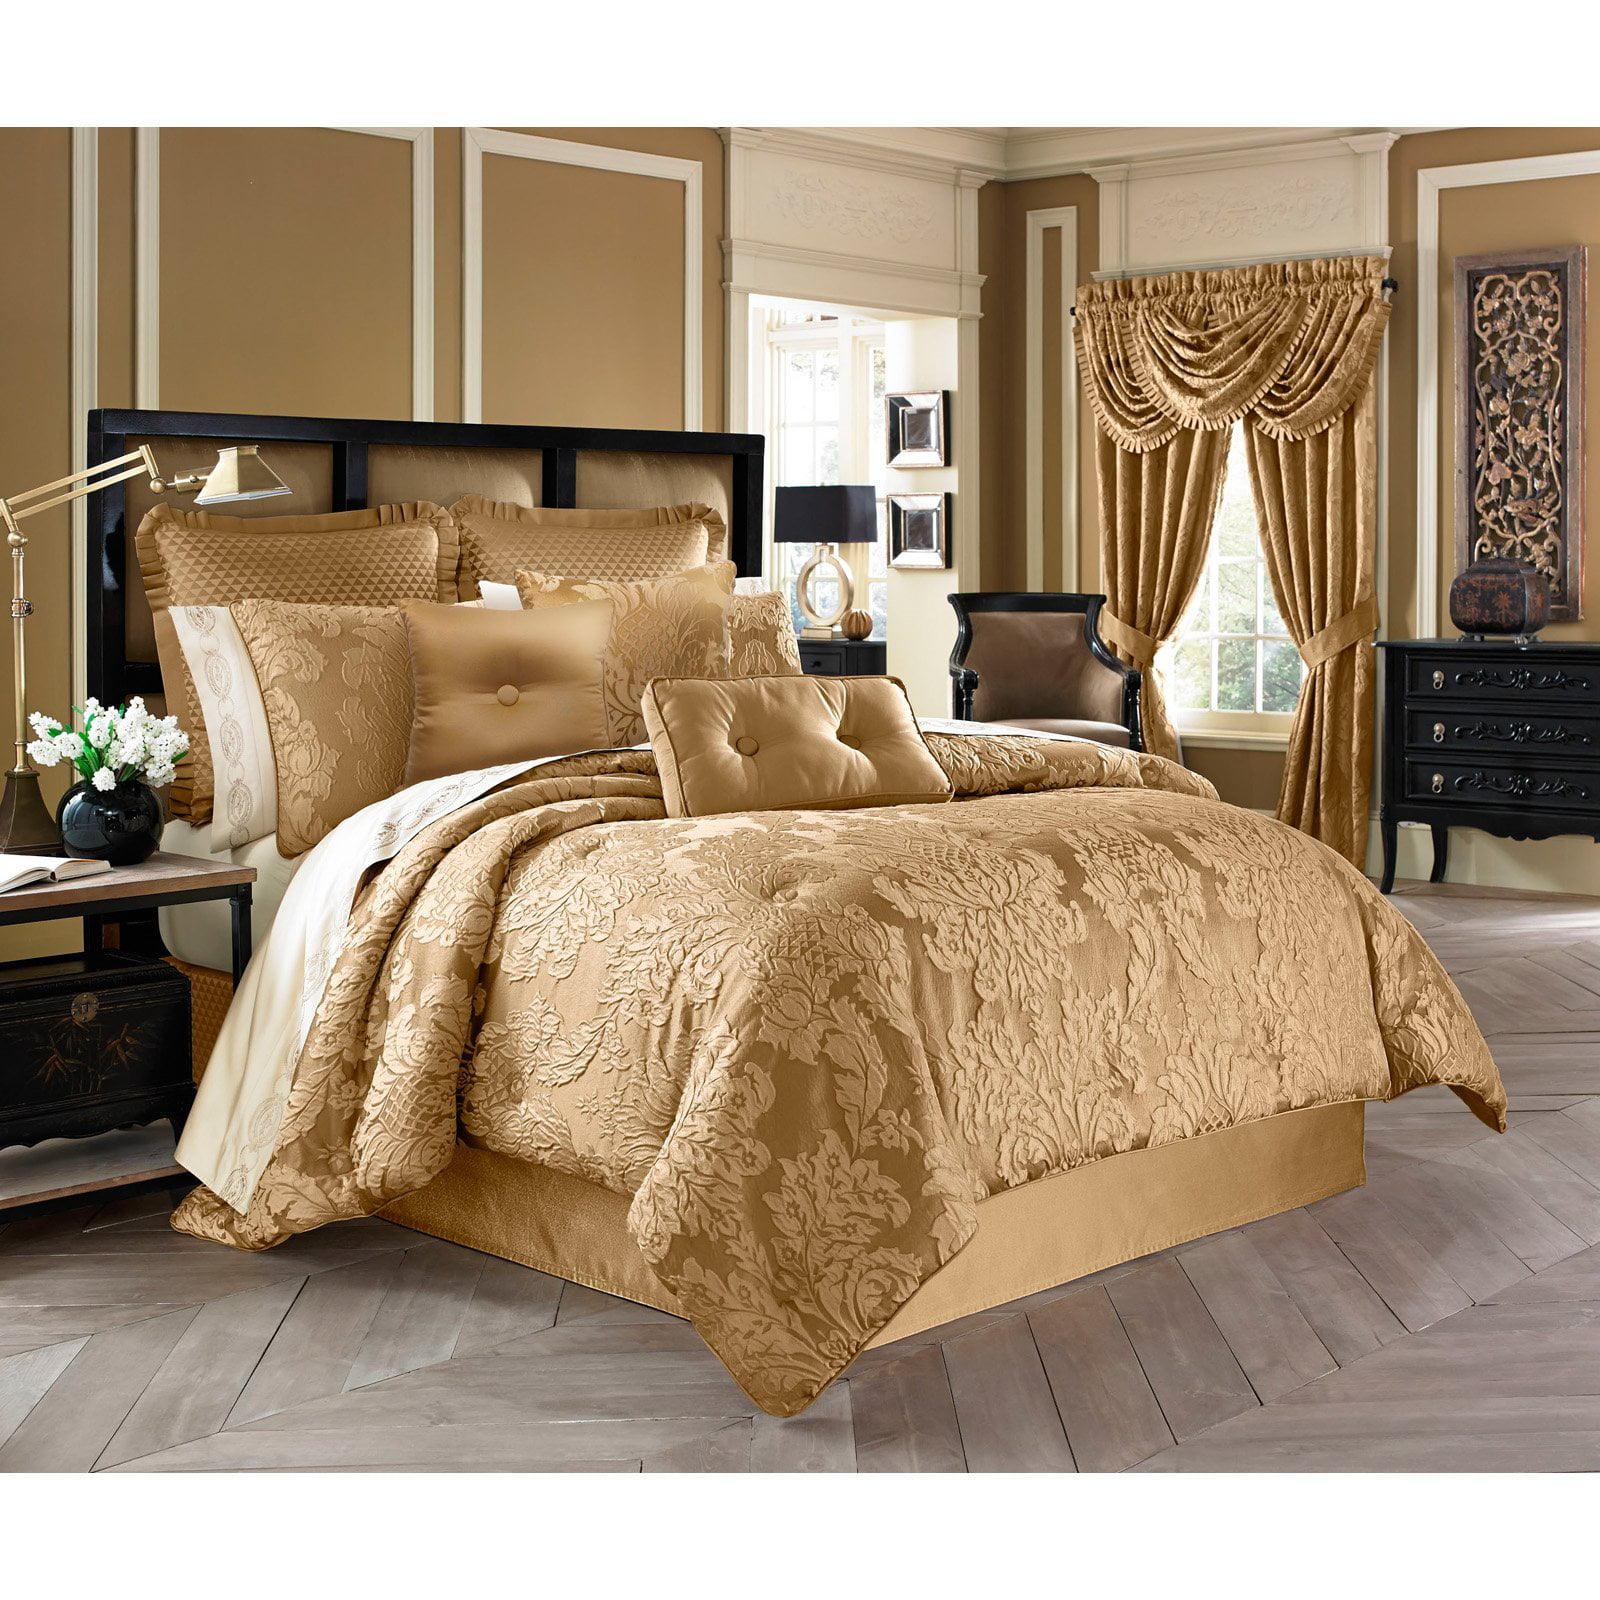 Colonial 4 Piece Comforter Set by Five Queens Court